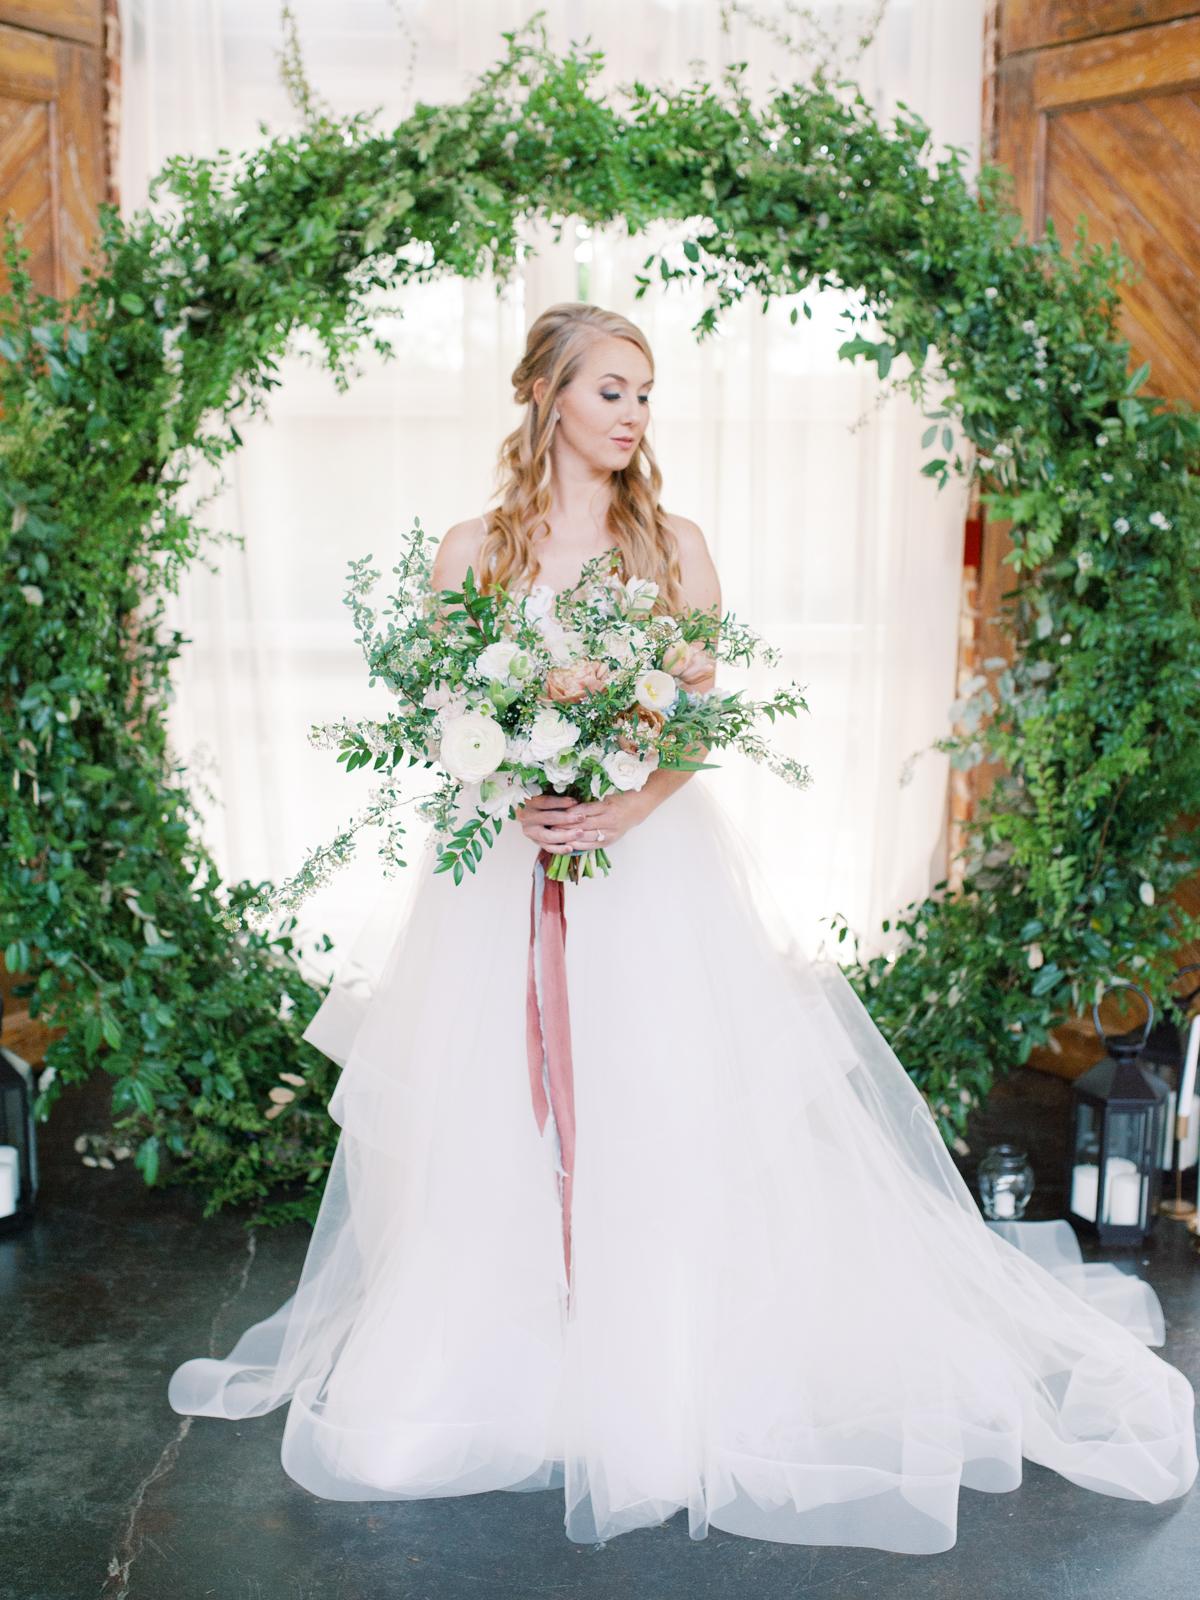 Foundry-At-Puritan-Mill-wedding-photos-venue-atlanta-fine-art-film-photographer18.JPG